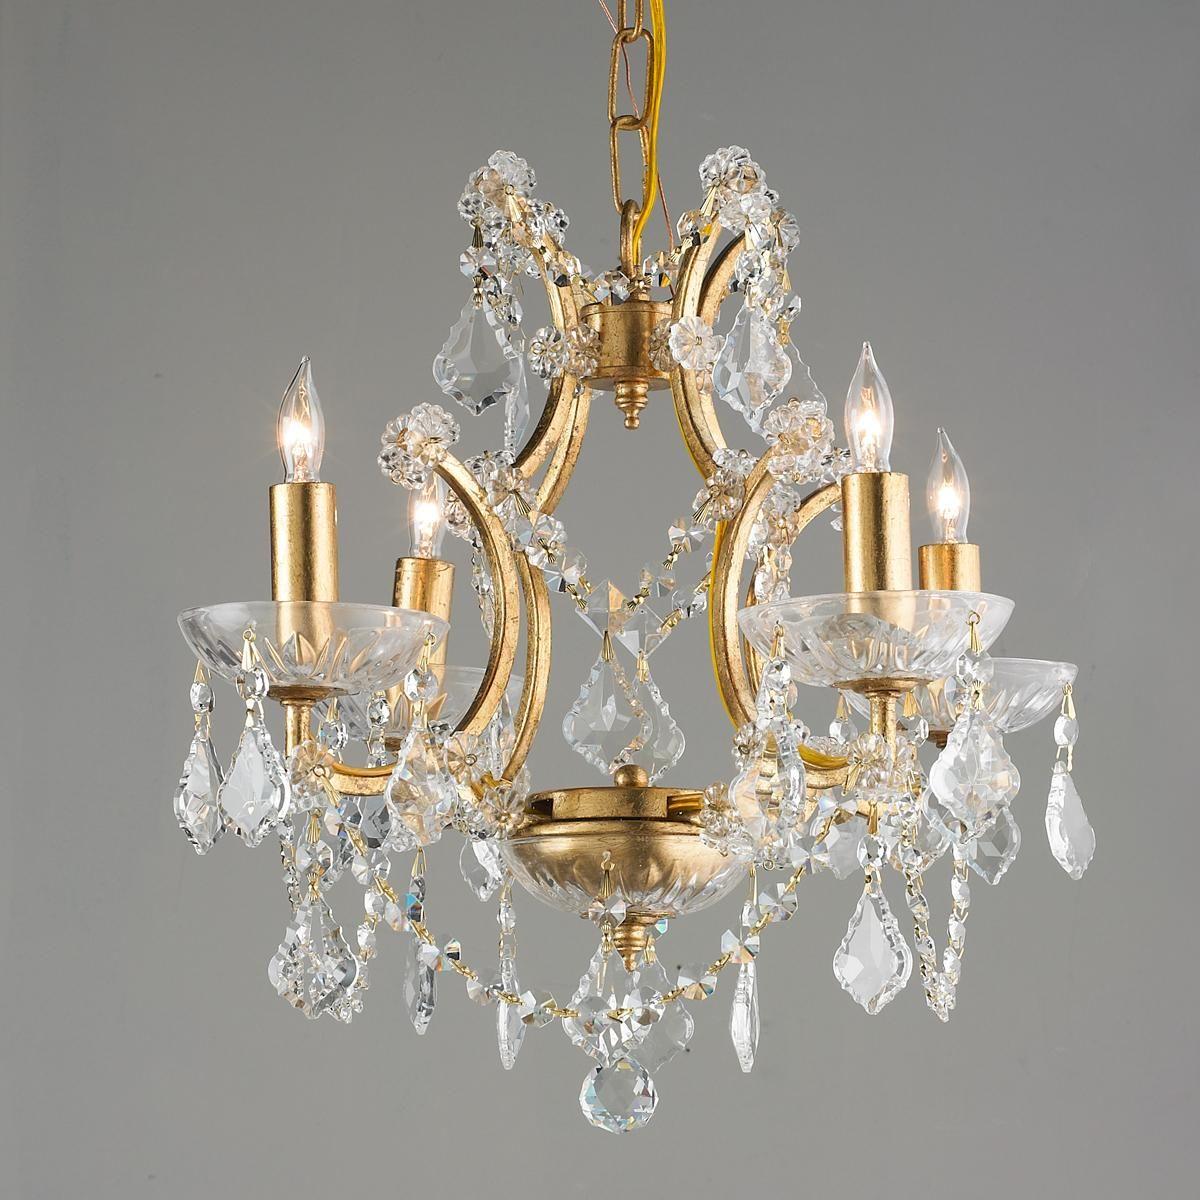 Gold leaf and crystal mini chandelier mini chandelier powder room gold leaf and crystal mini chandelier arubaitofo Gallery